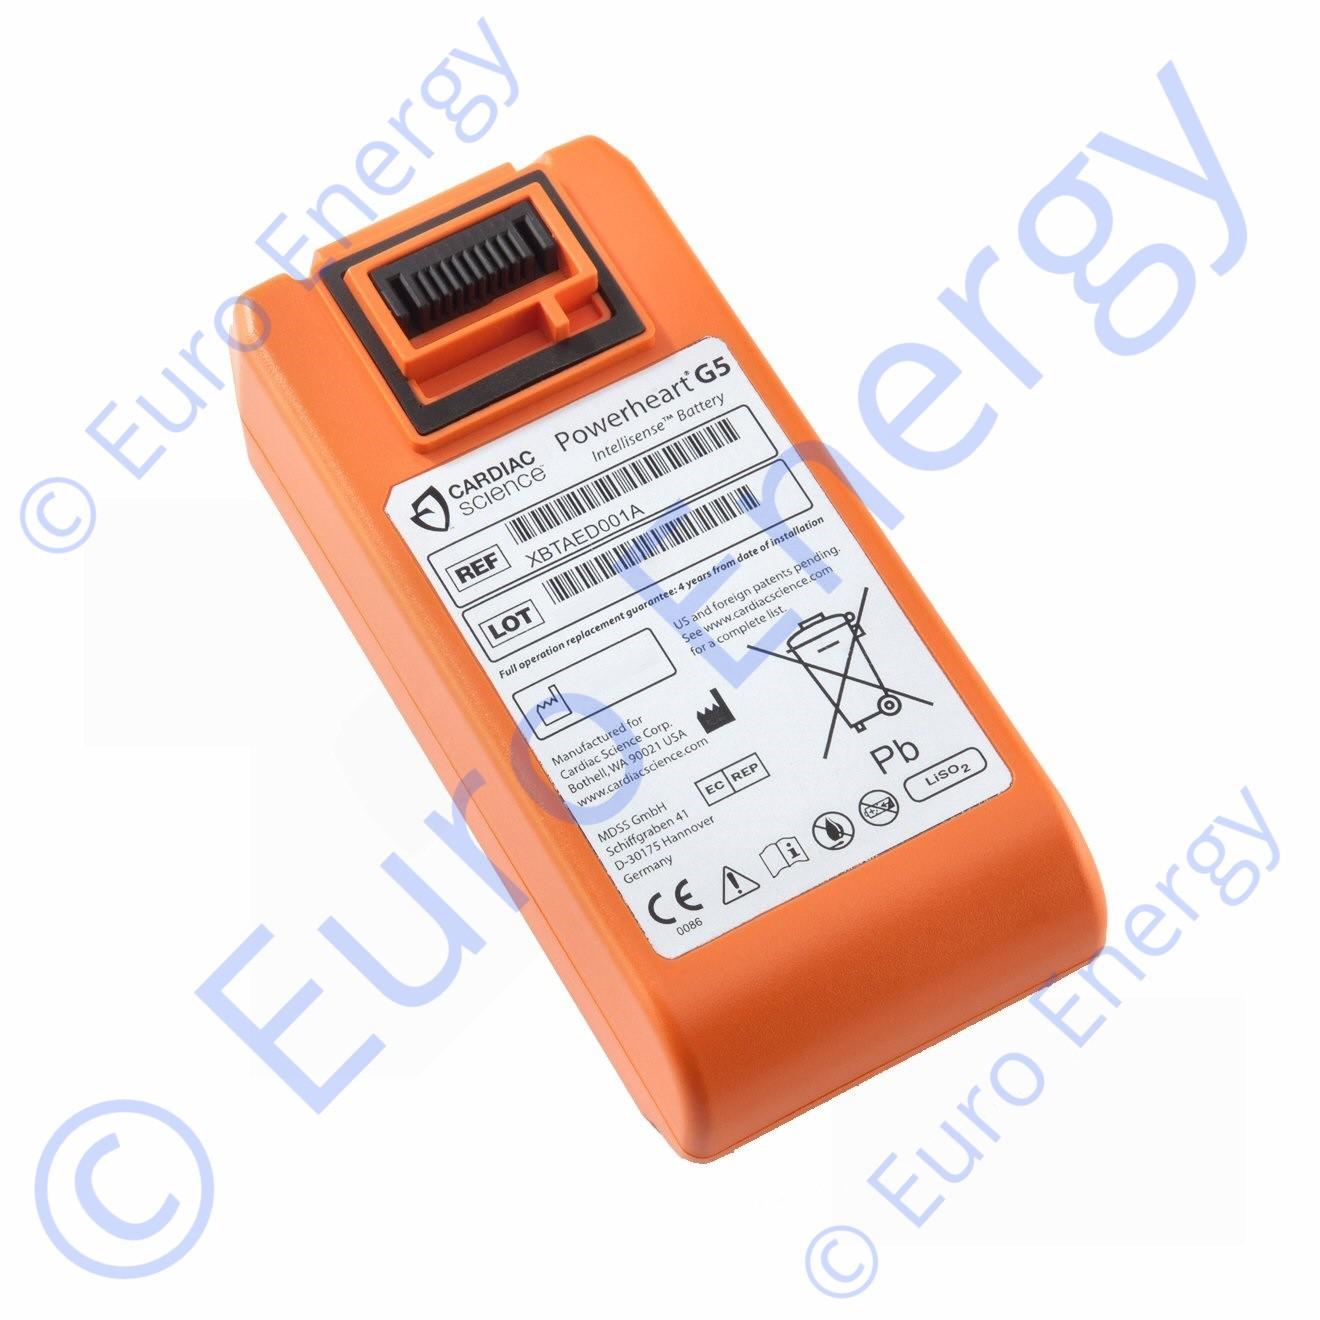 Cardiac Science Powerheart AED G5, XBTAED001A Original Medical Battery 02284